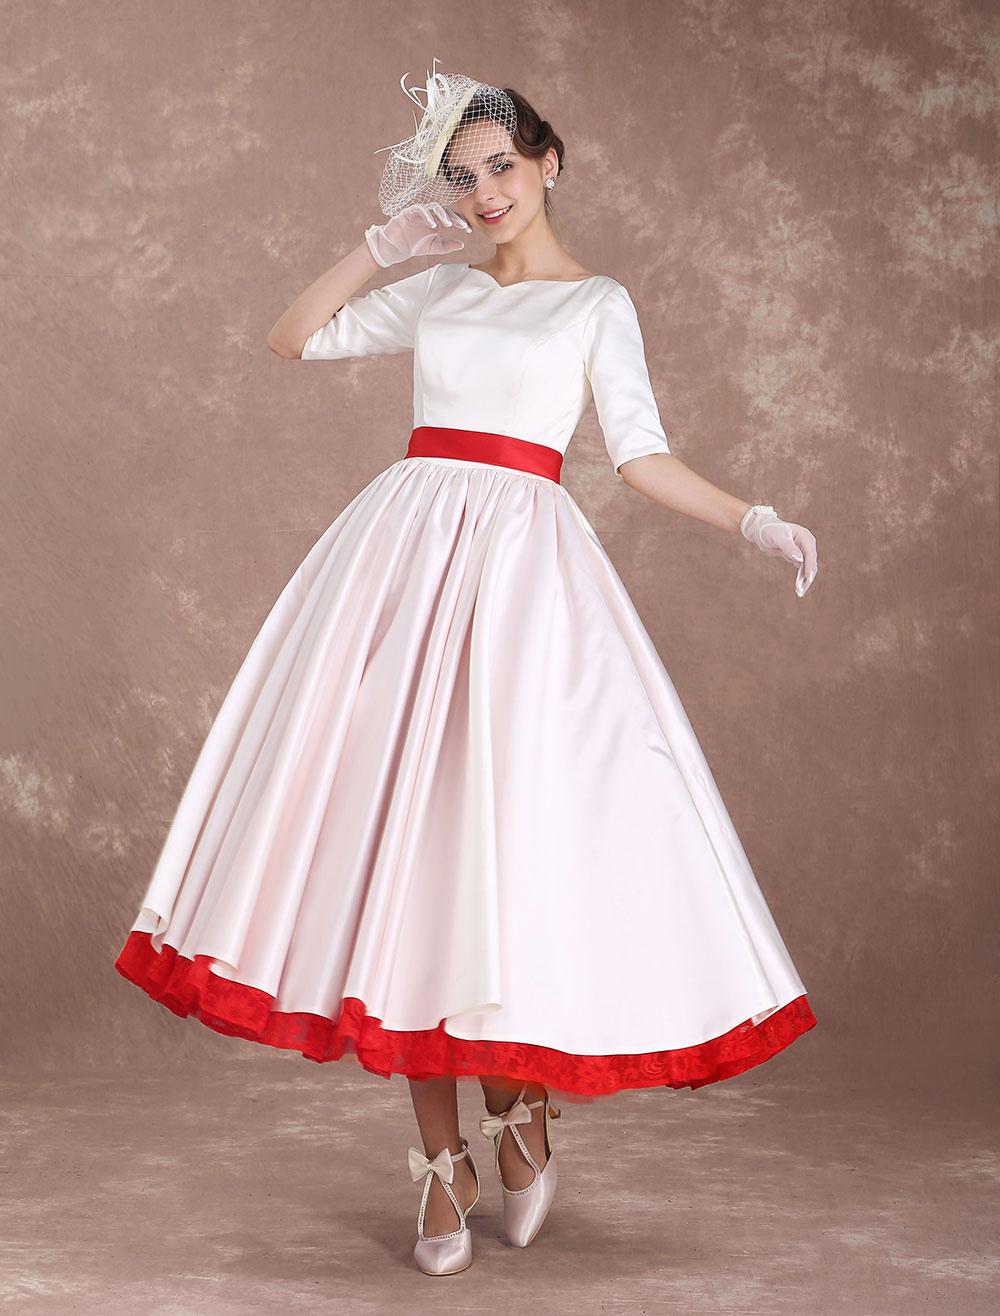 rockabilly 1950s wedding dresses